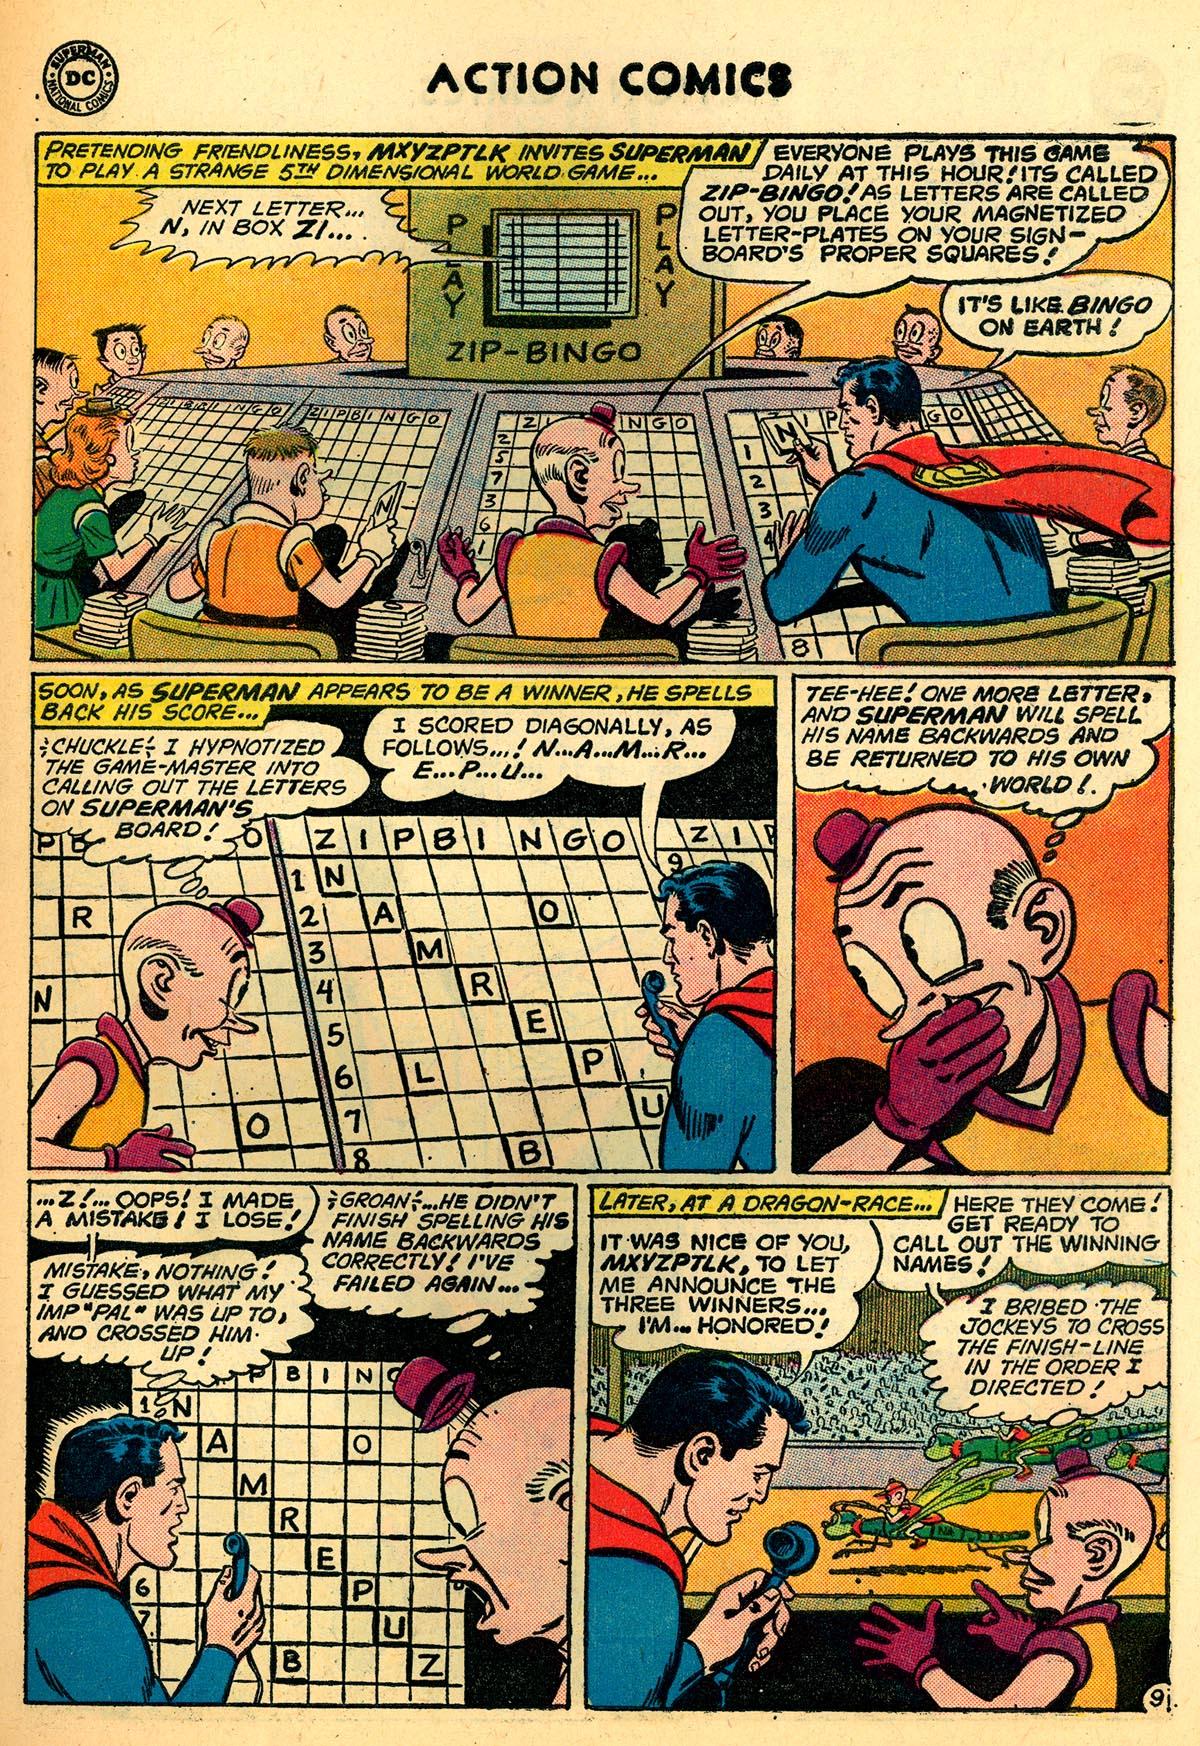 Action Comics (1938) 273 Page 10